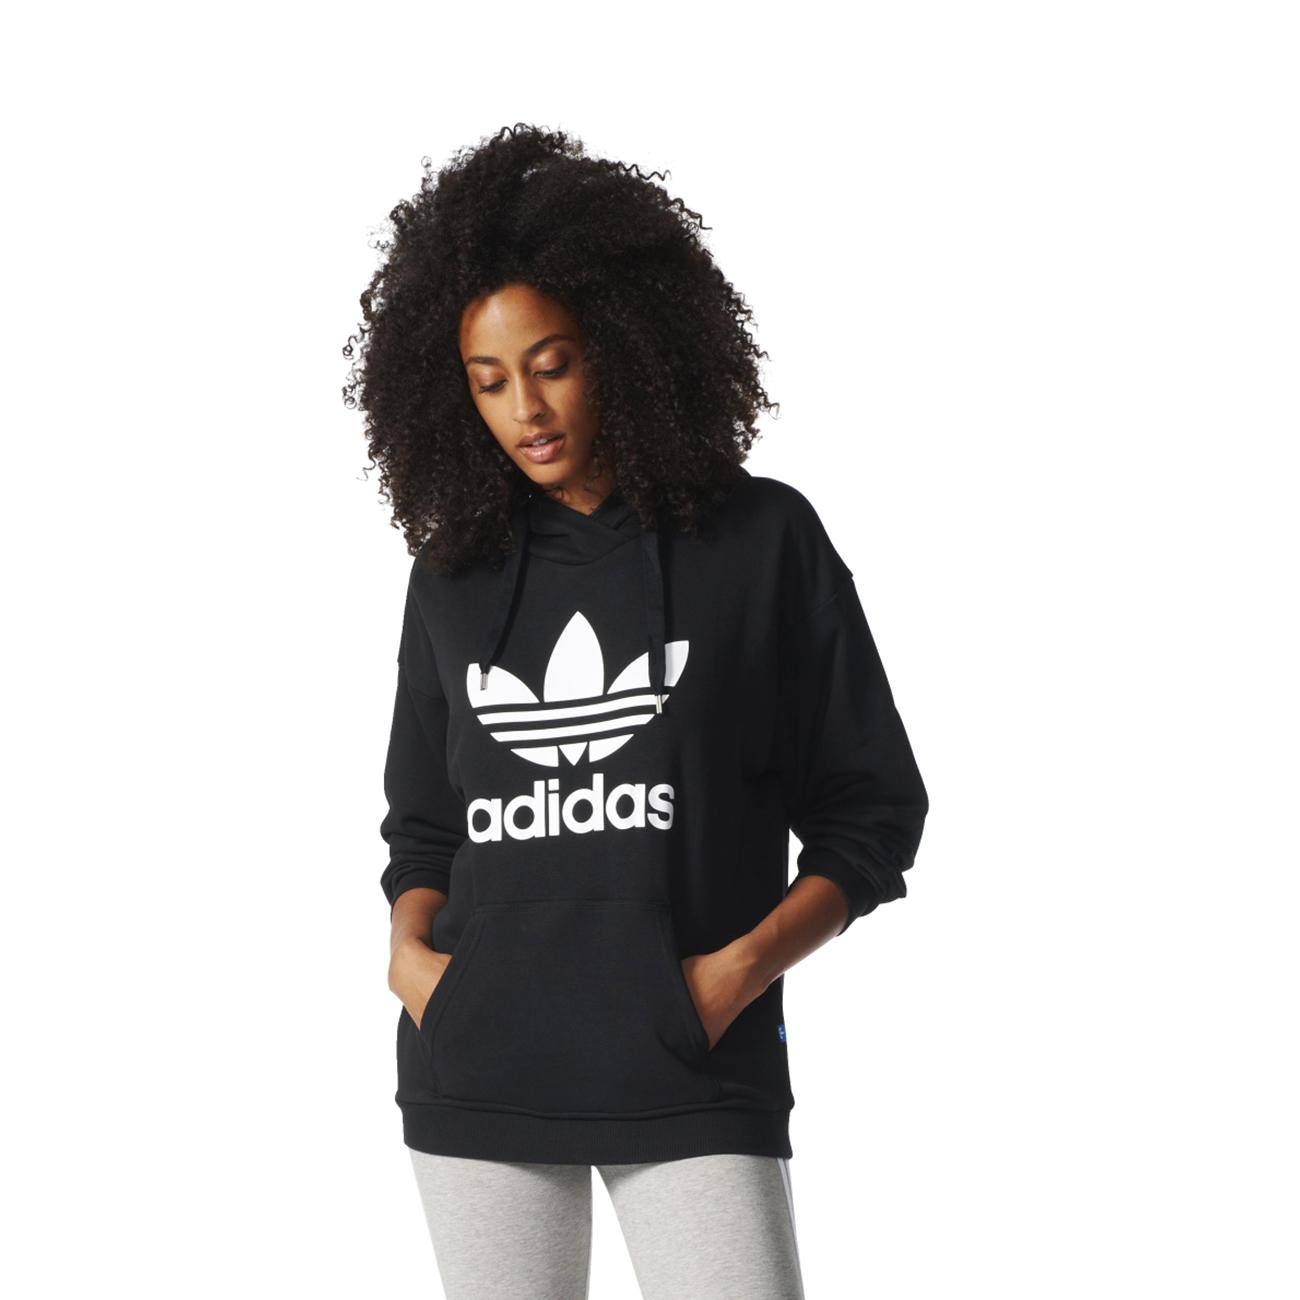 adidas originals trefoil hoodie black sweater grey. Black Bedroom Furniture Sets. Home Design Ideas